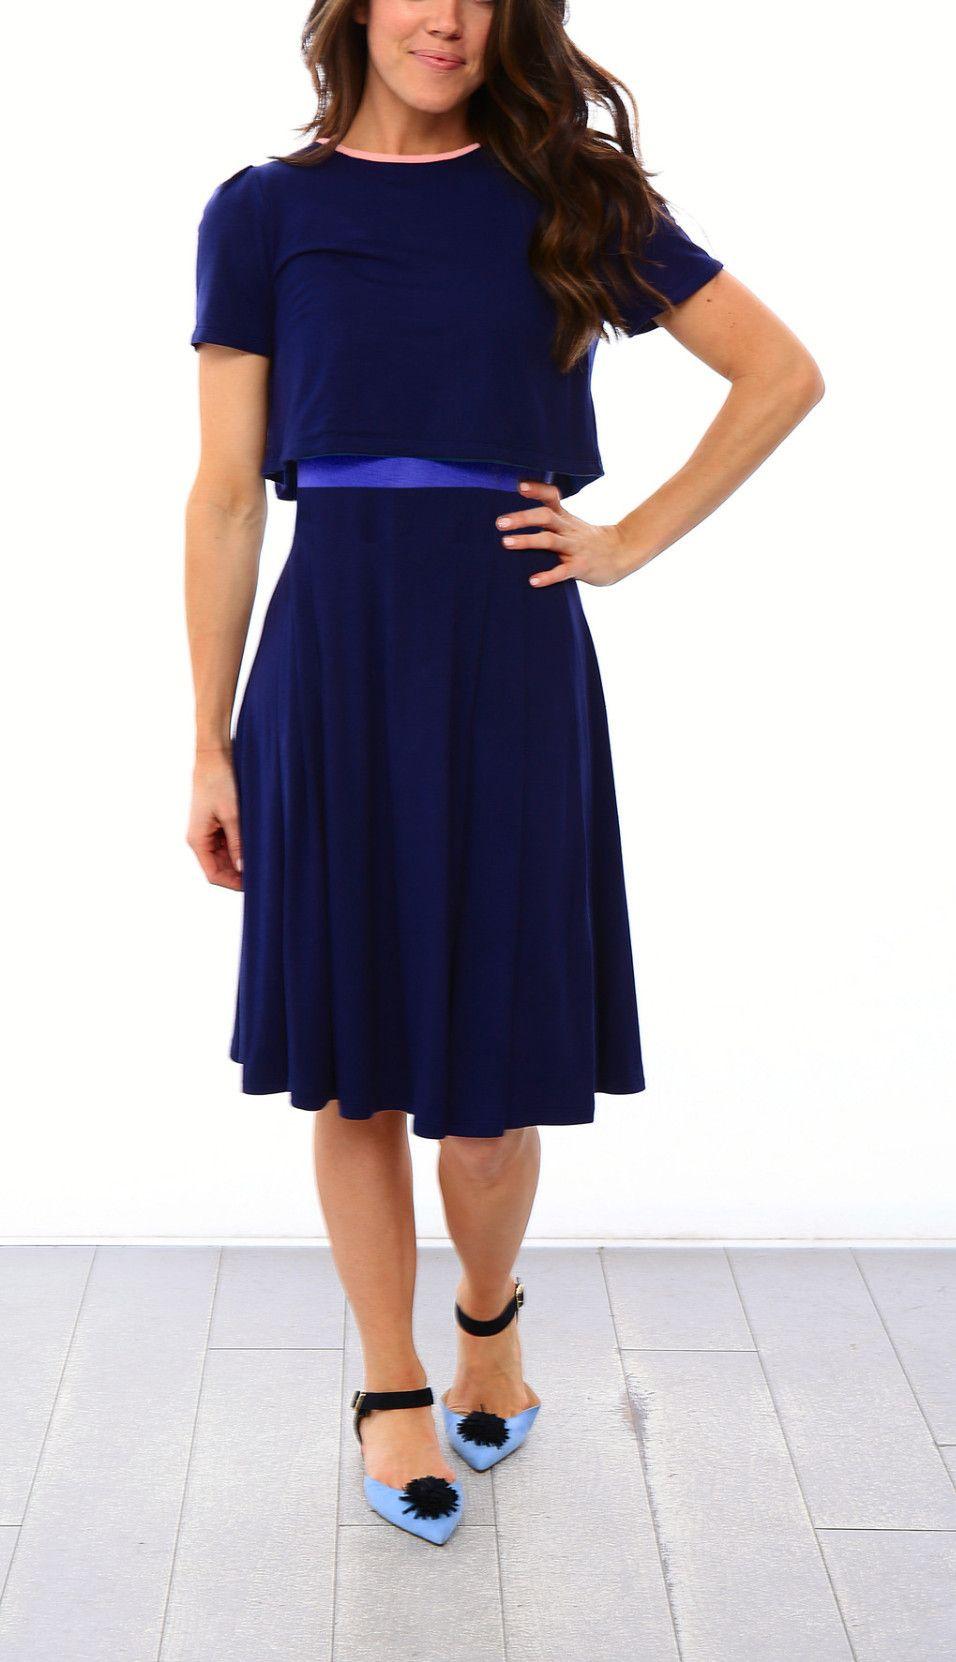 e214e1fb5958d Crop Top Skater Nursing Dress - Navy/Royal Blue | Harper & Bay ...